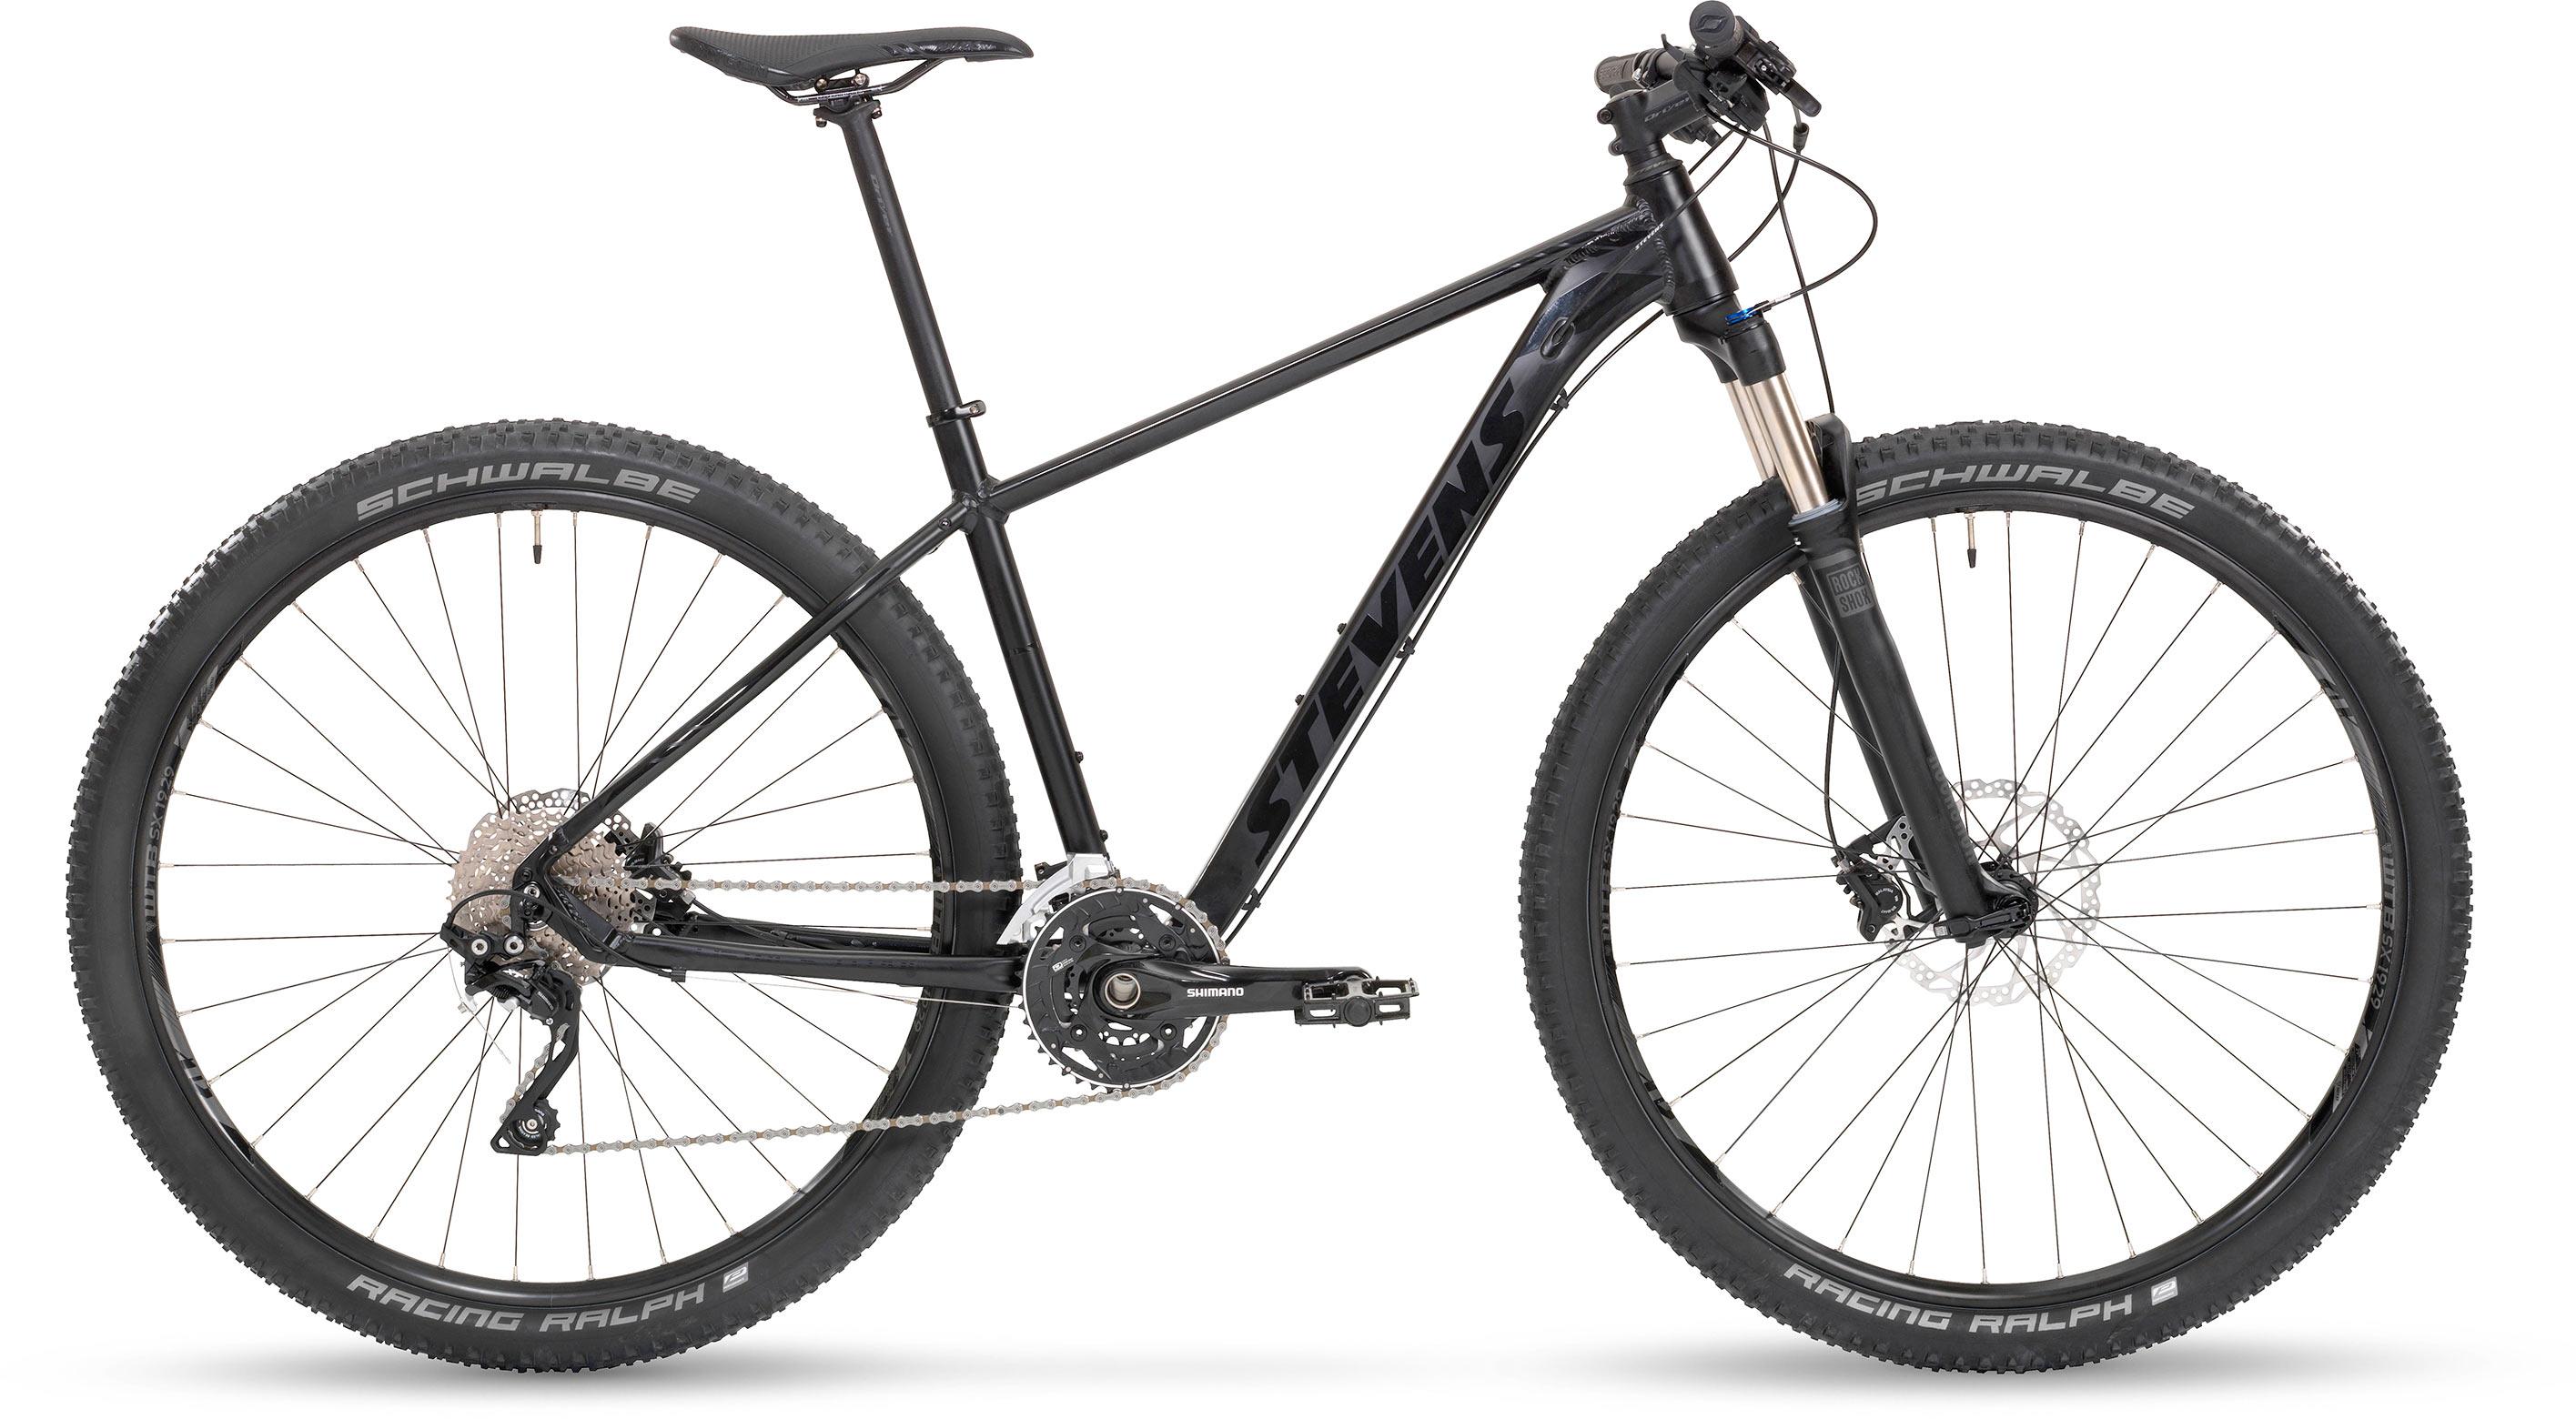 giant fiets centro l